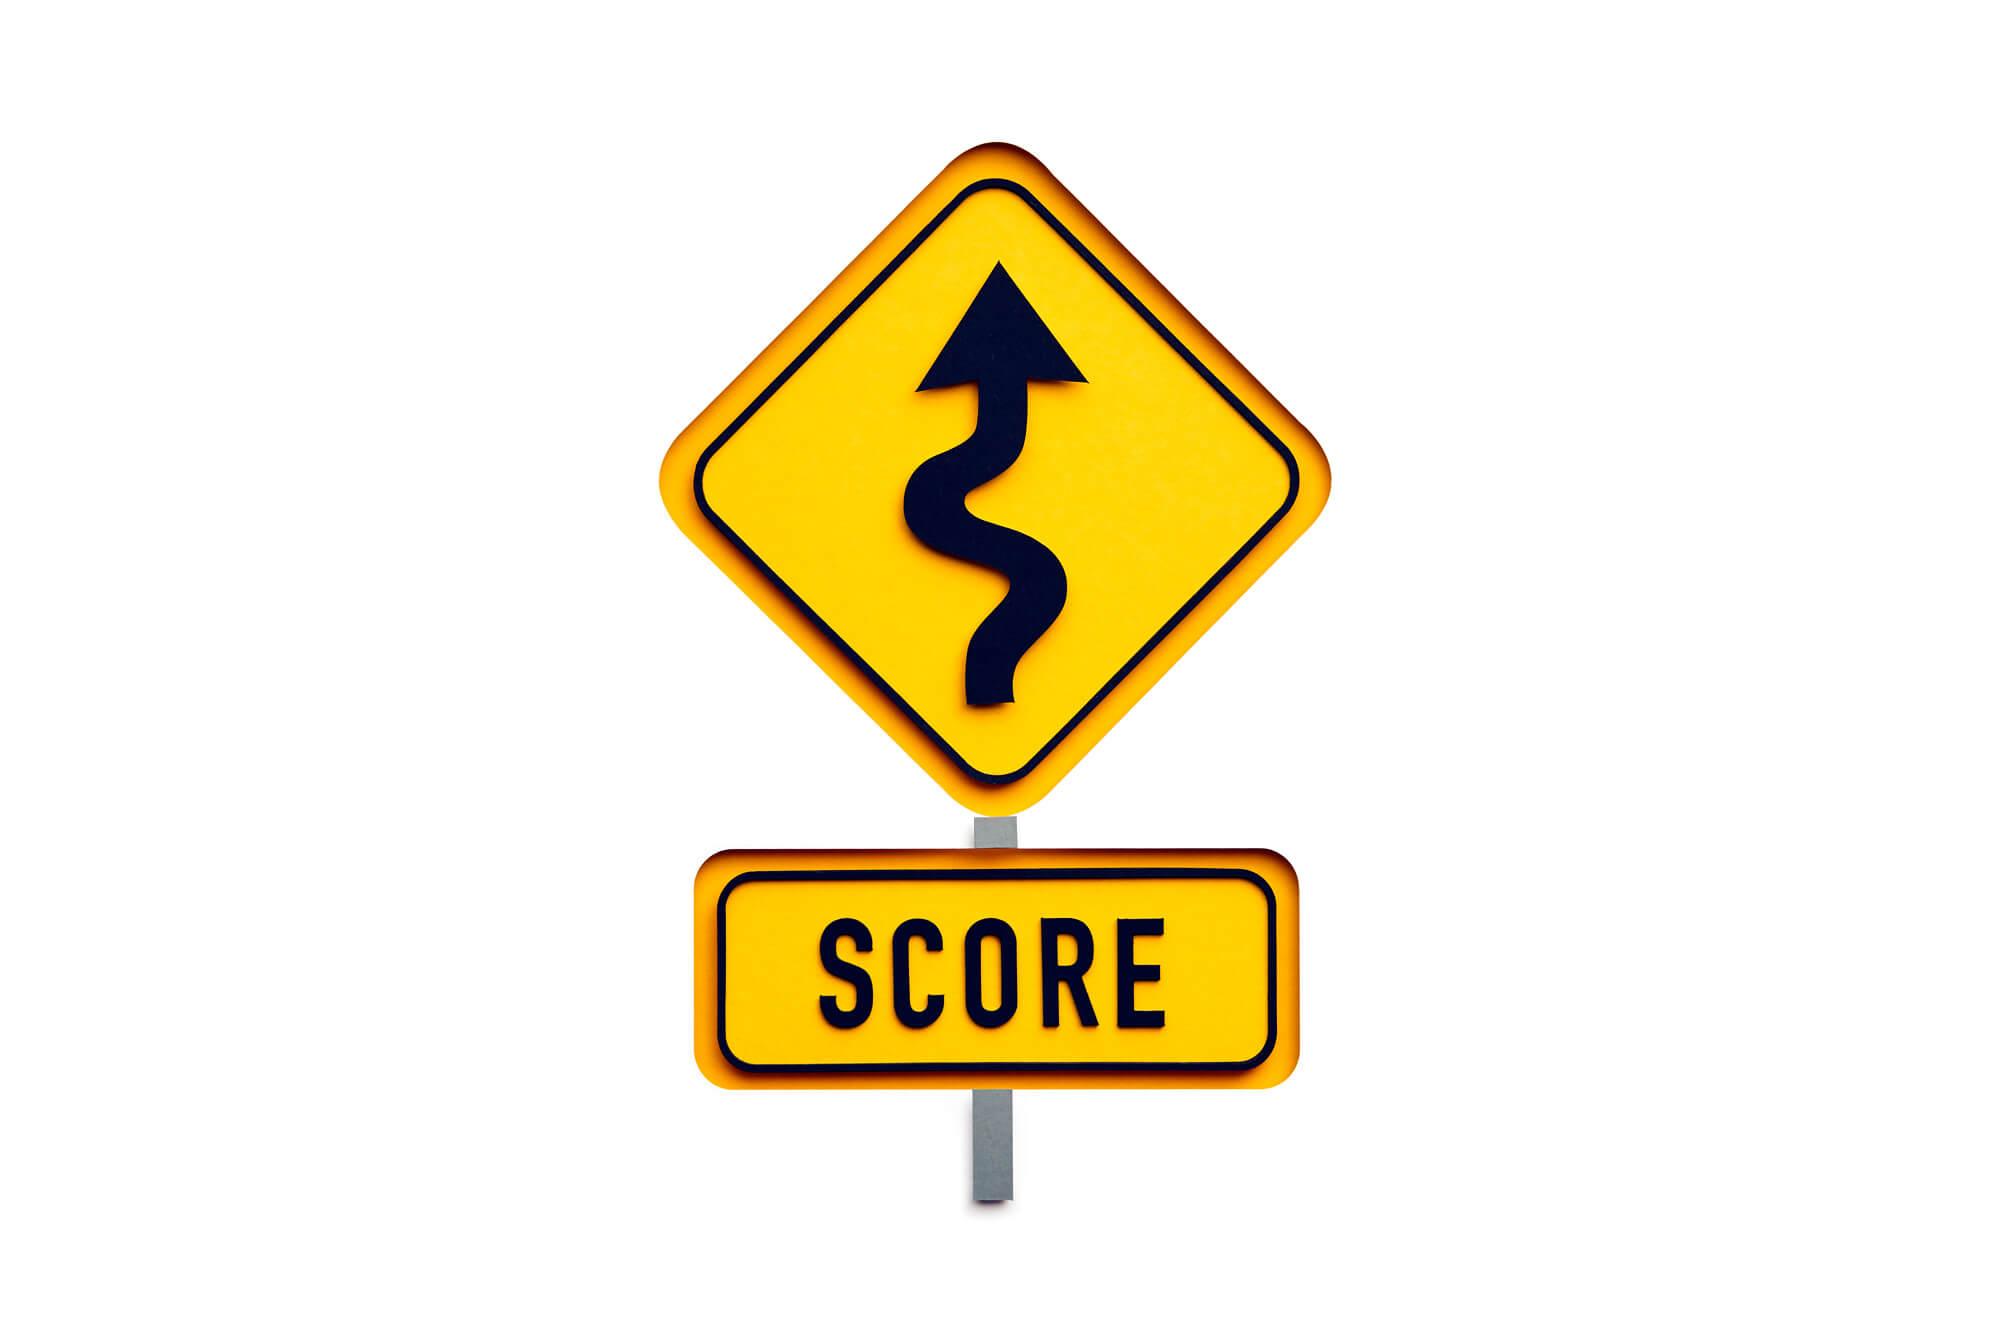 score_Synchronybank_paperart_katrinrodegast_sign